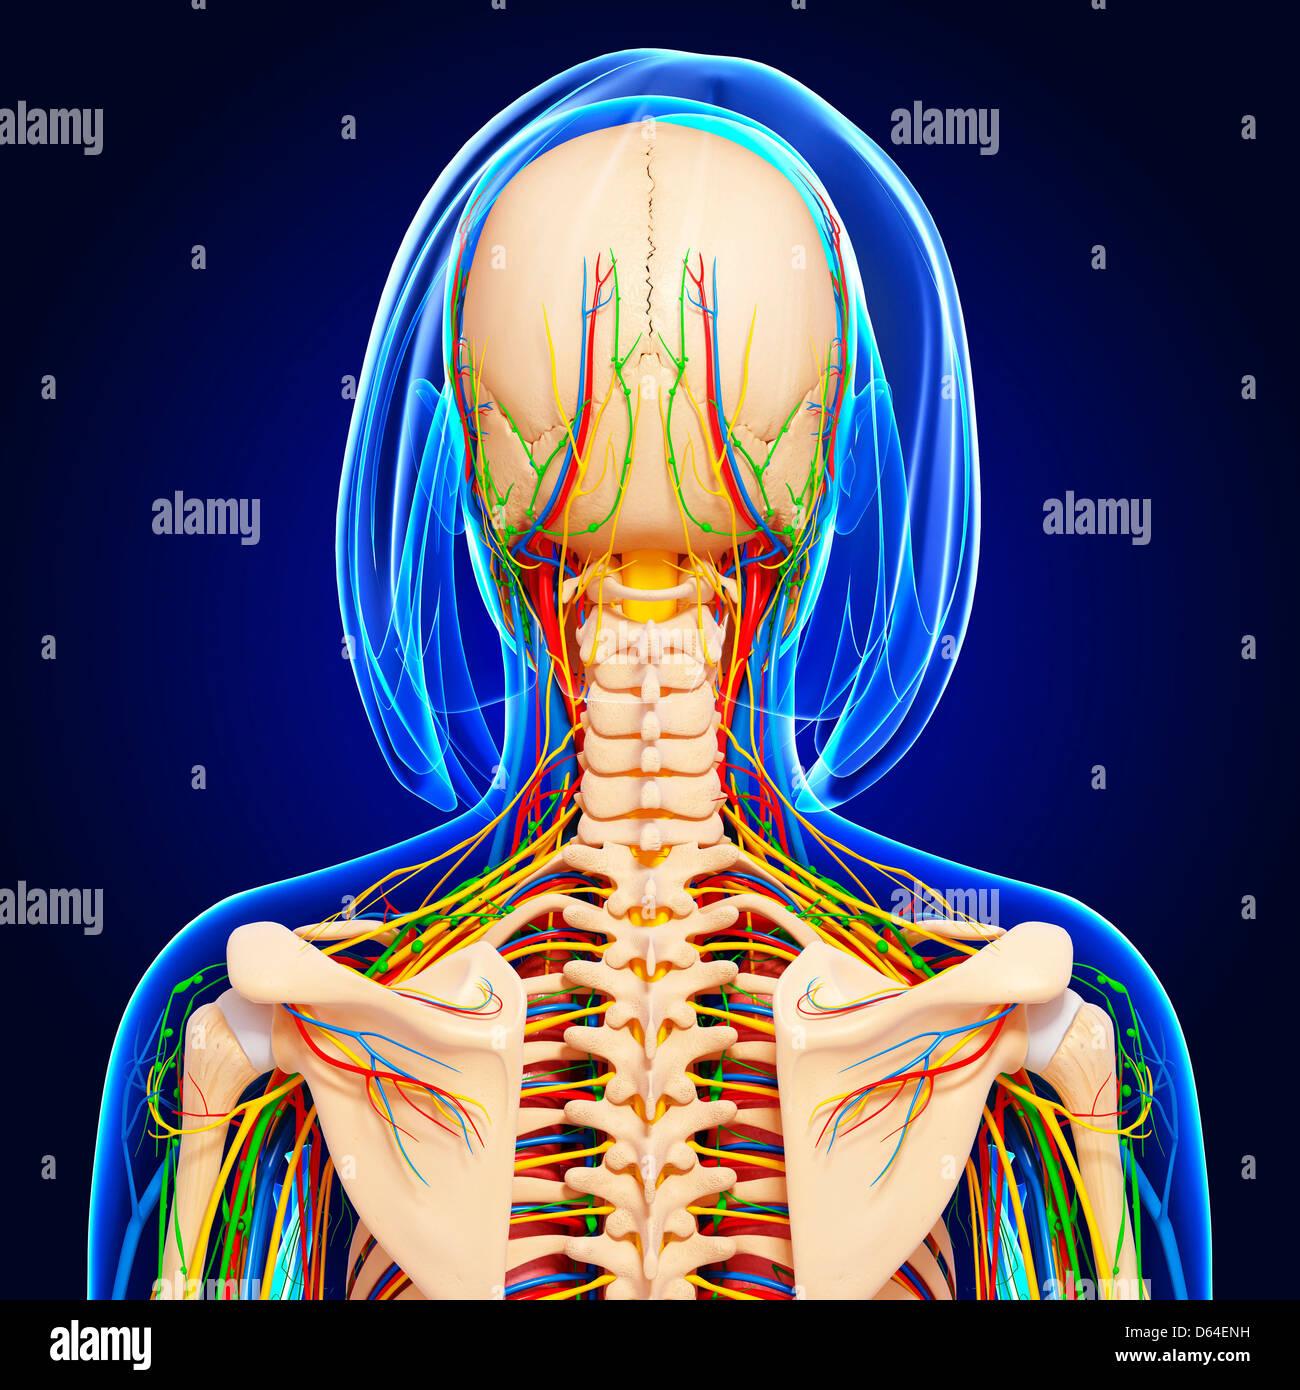 Oberkörper-Anatomie, artwork Stockfoto, Bild: 55418429 - Alamy